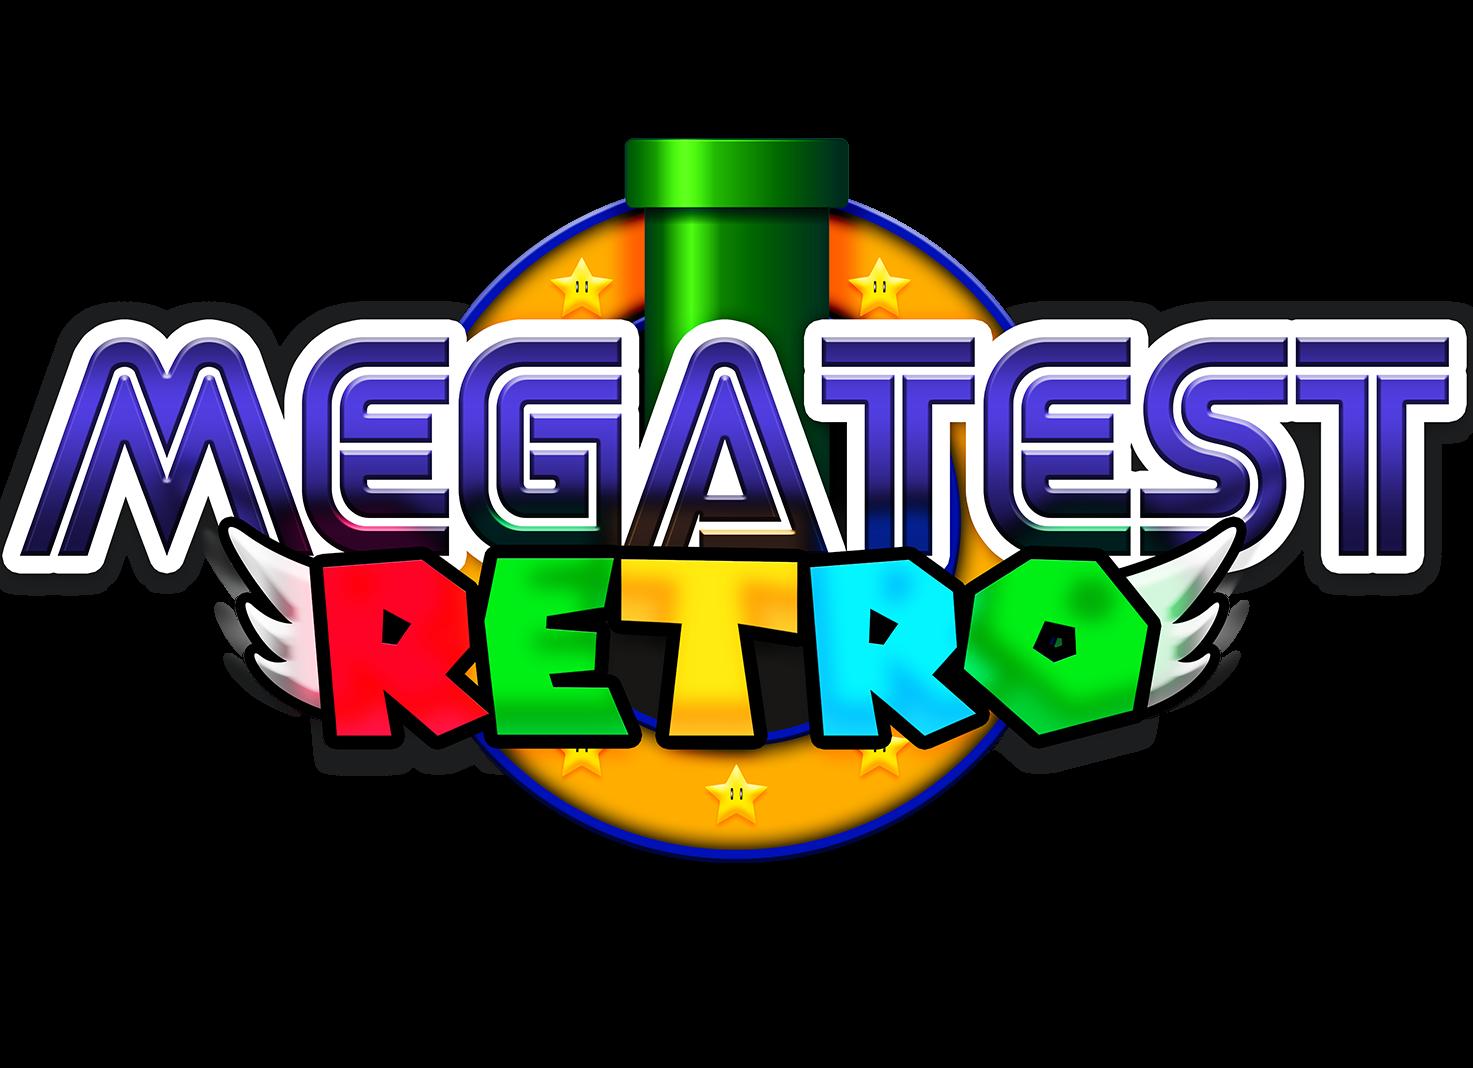 Megatest.fr – MegatestRetro